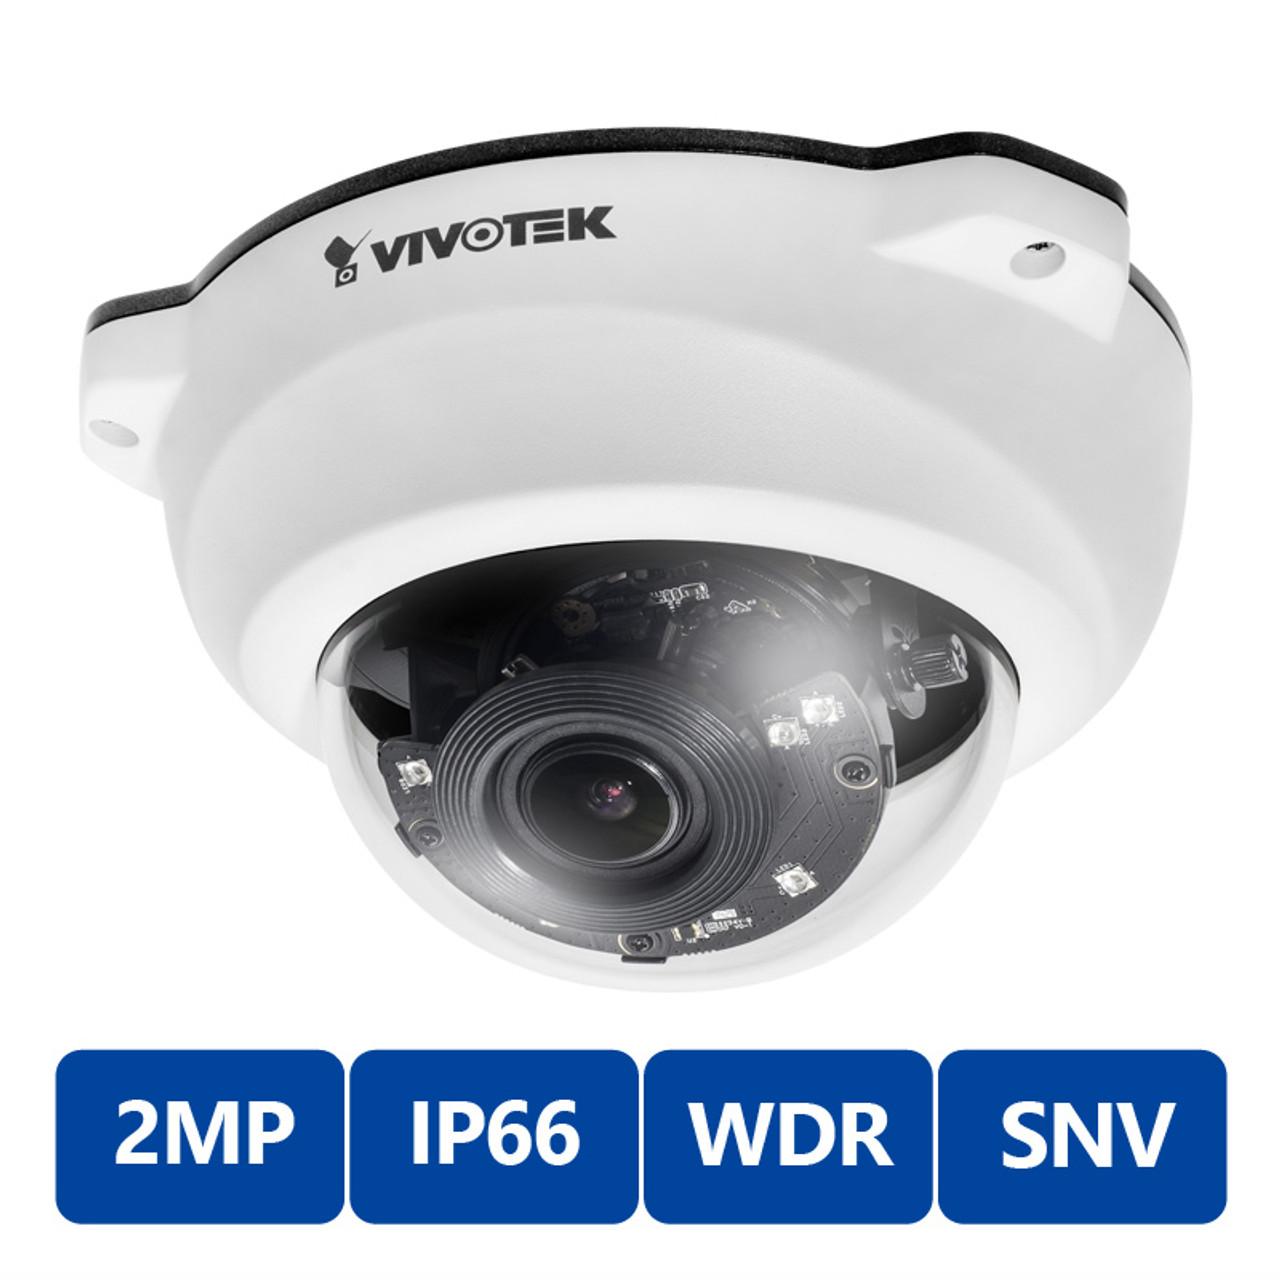 VIVOTEK FD8367-V NETWORK CAMERA WINDOWS 7 X64 DRIVER